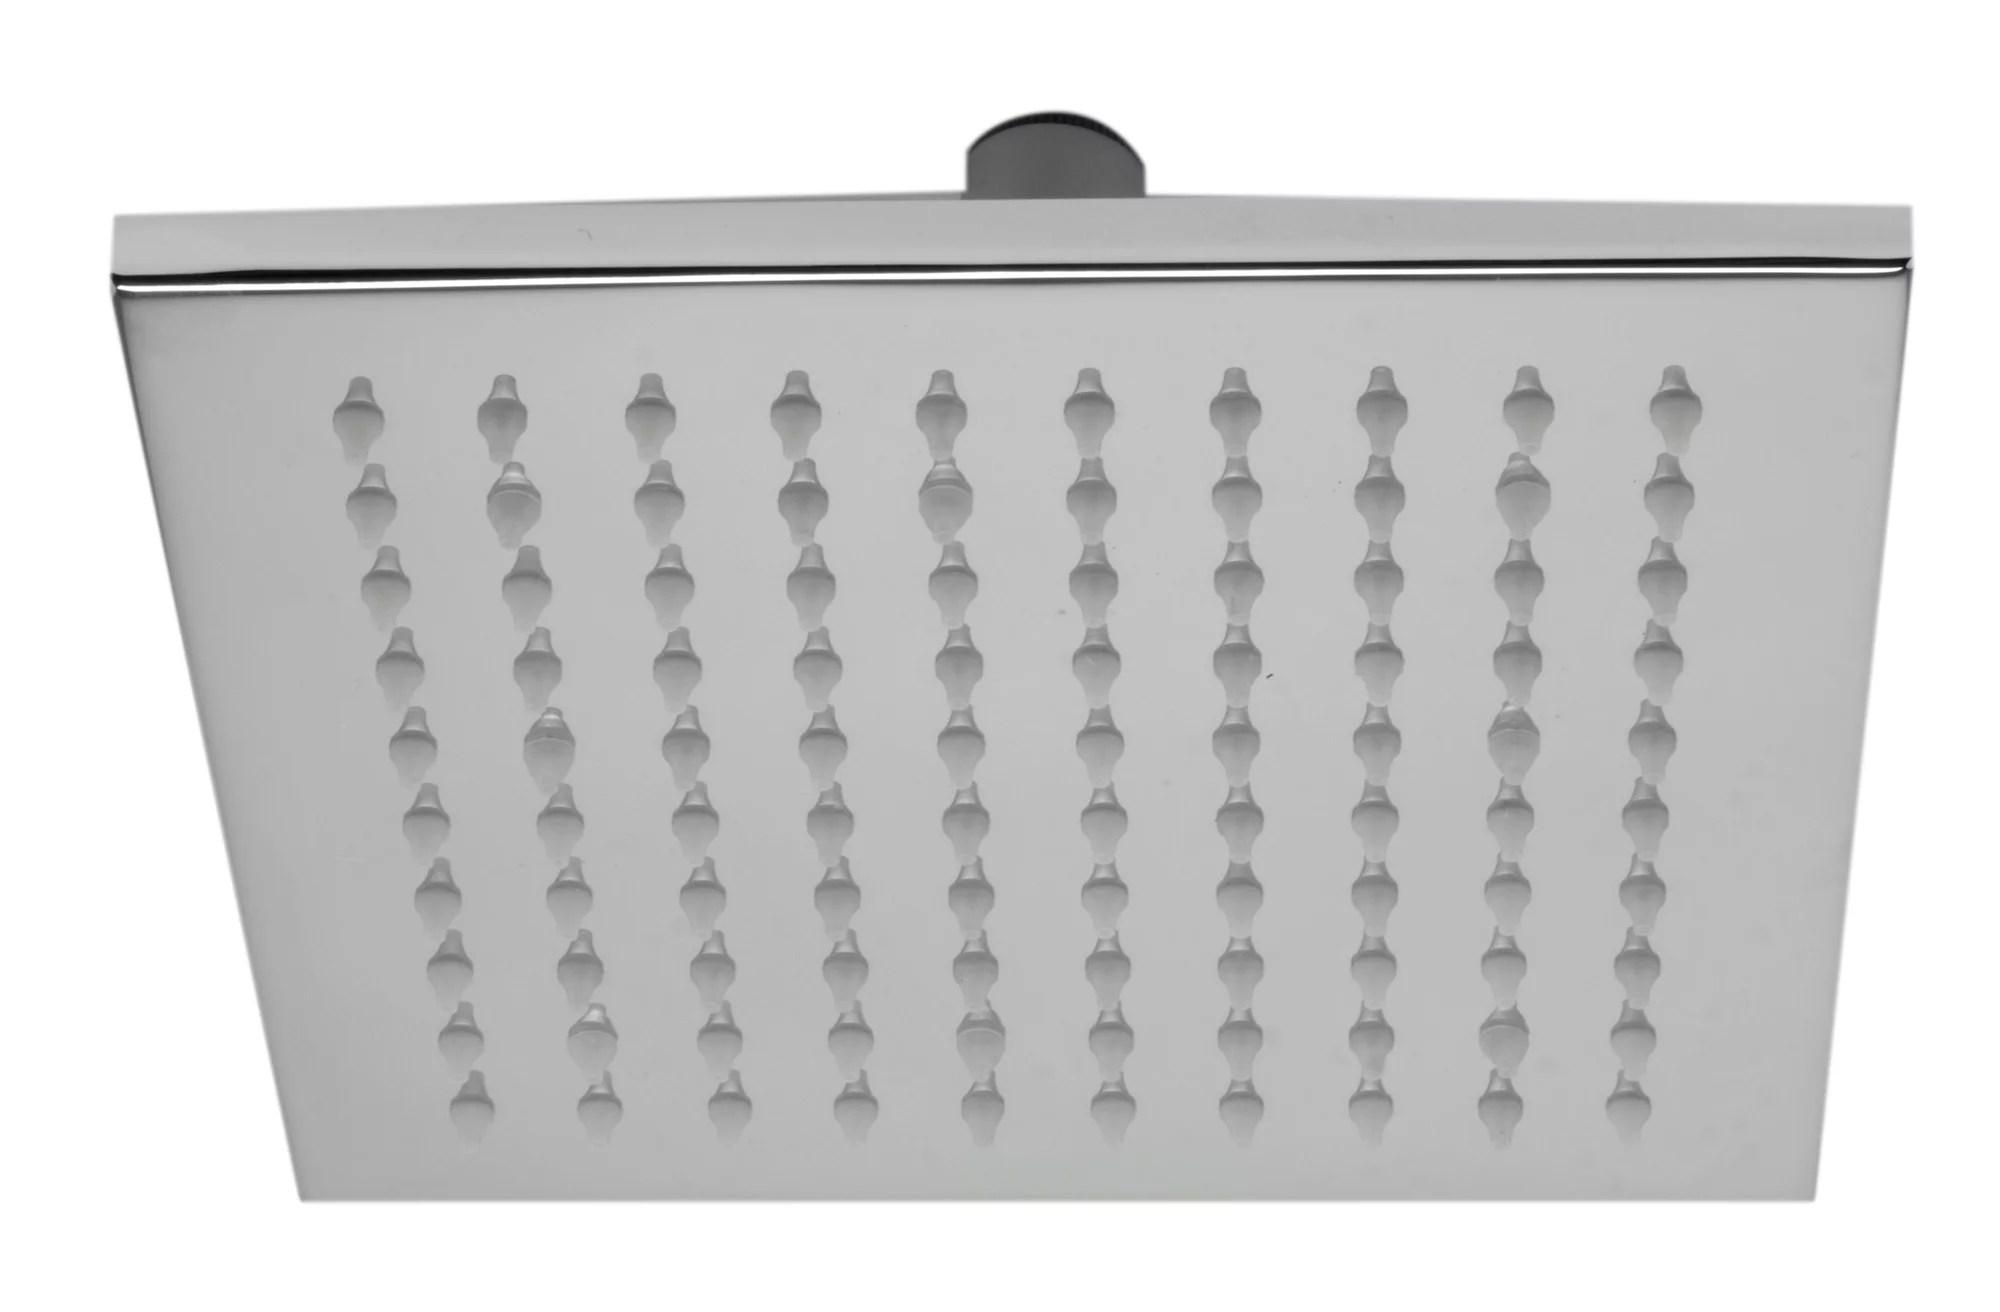 Alfi Brand Led8s Bn Brushed Nickel 8 Square Multi Color Led Rain Shower Head